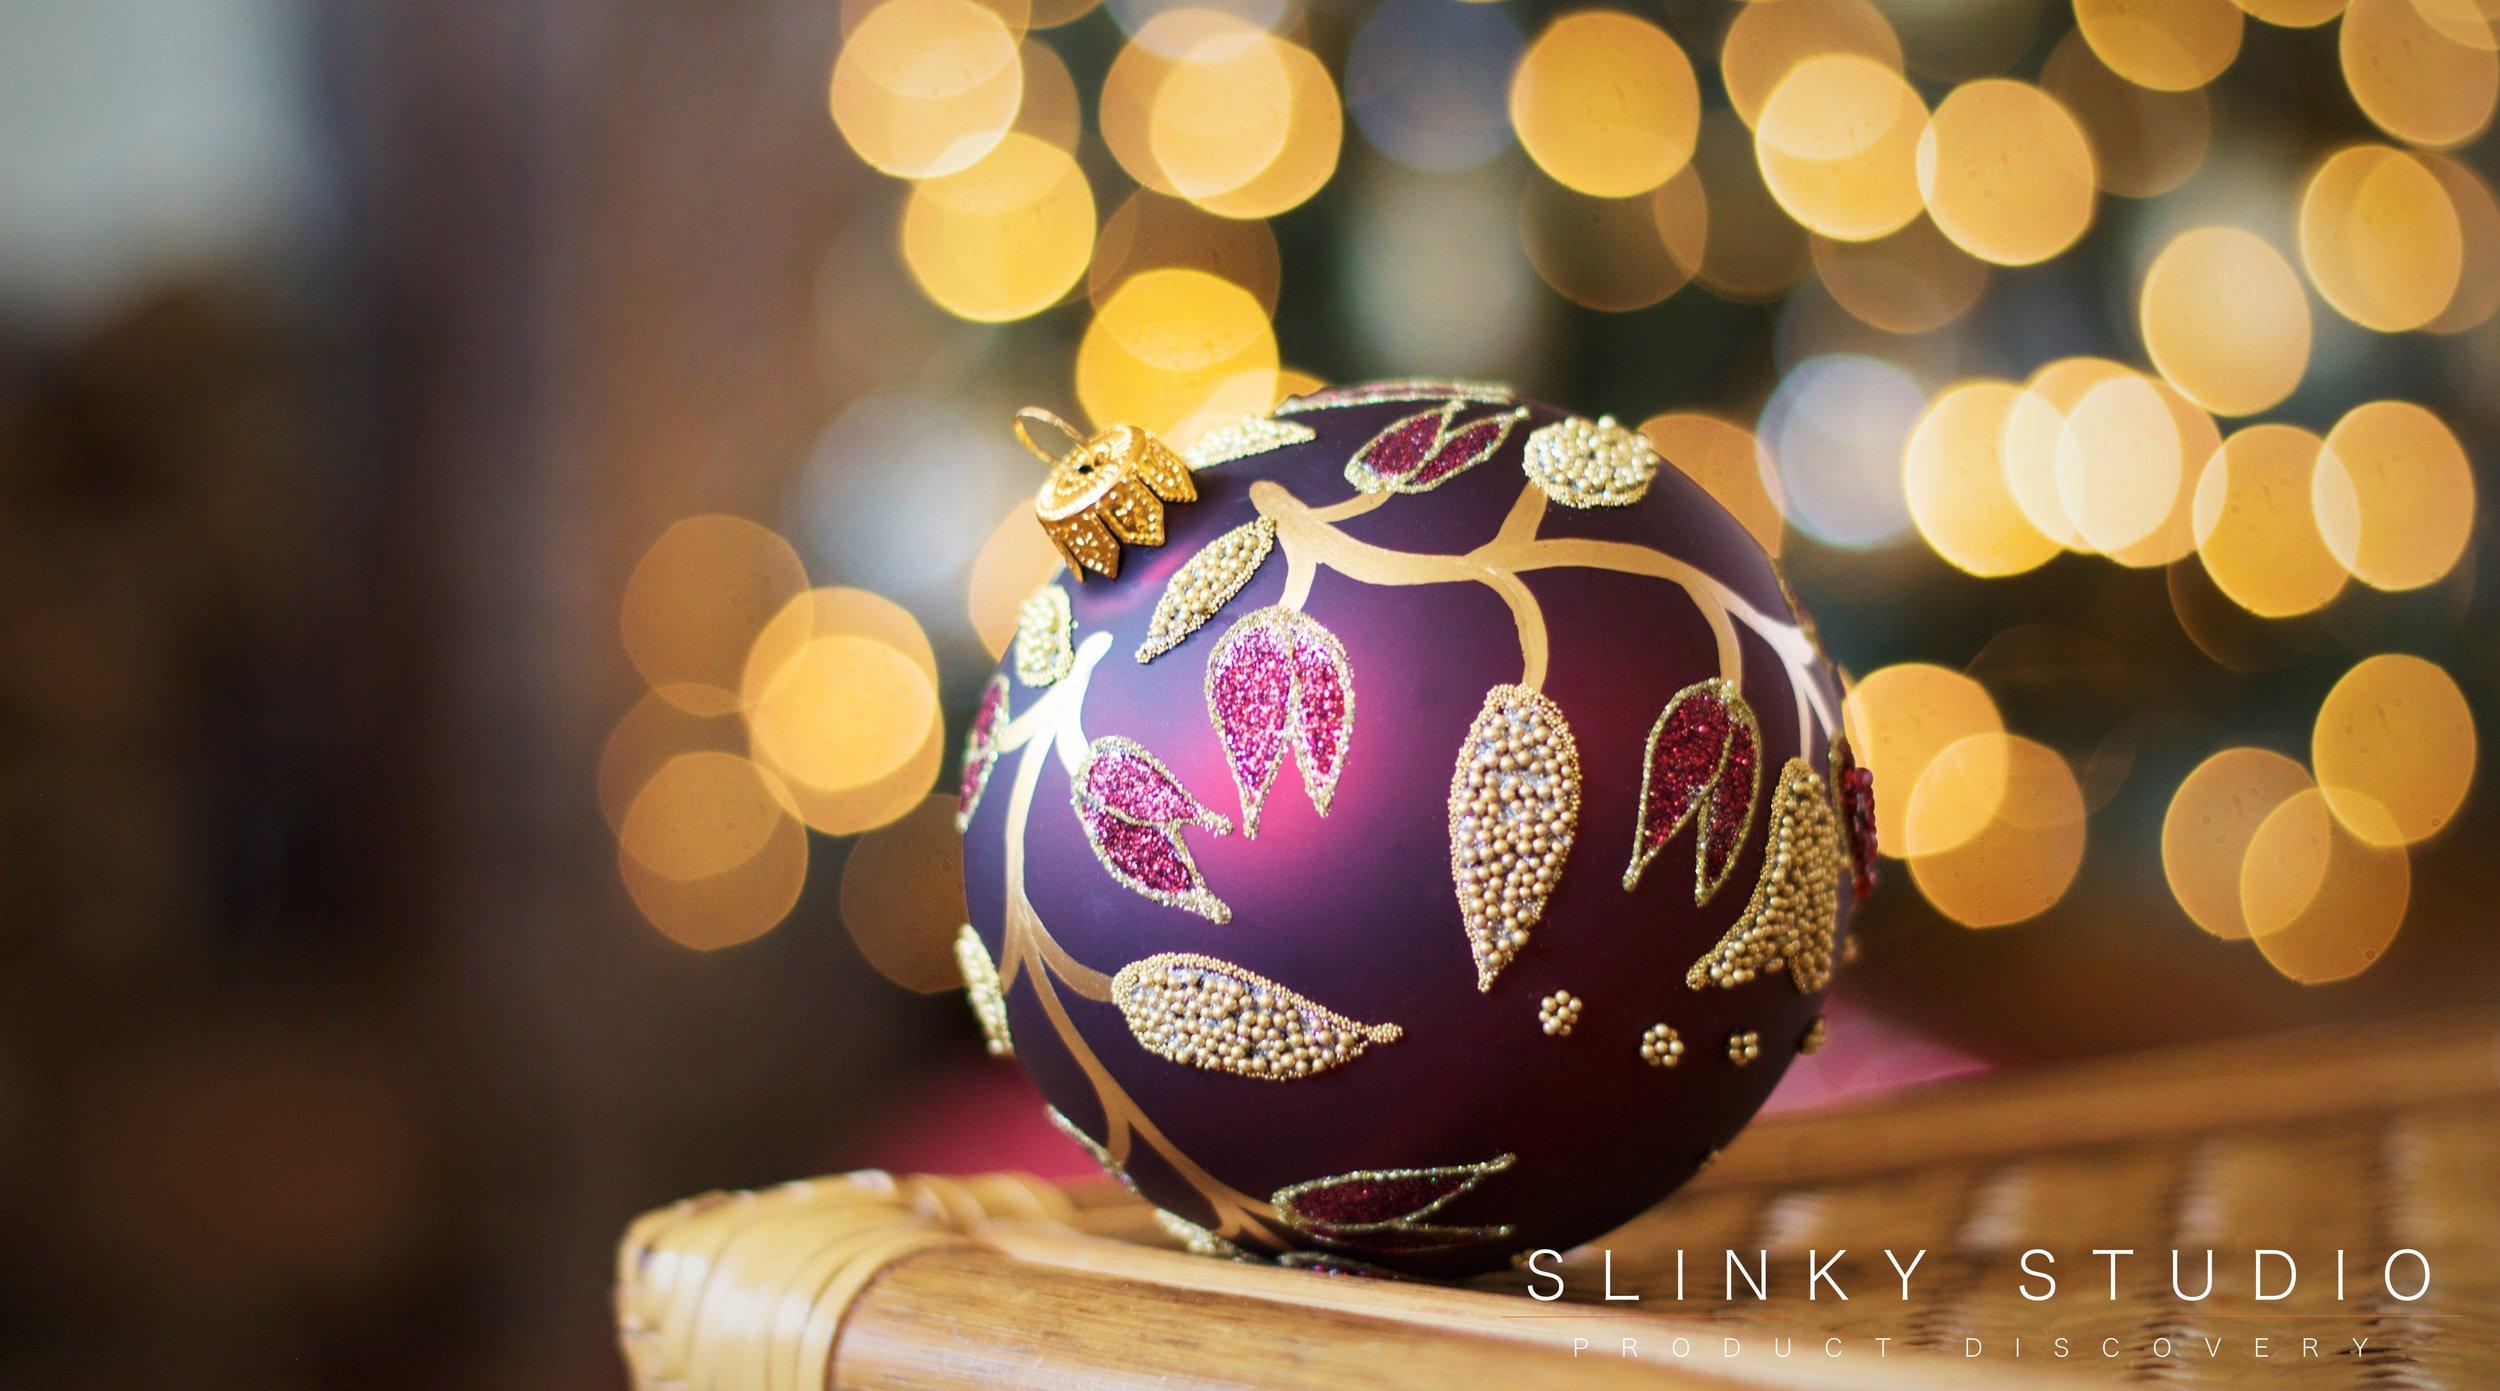 Balsam Hill Fraser Fir Christmas Tree Burgandy Glass Ornament Bauble Decoration.jpg